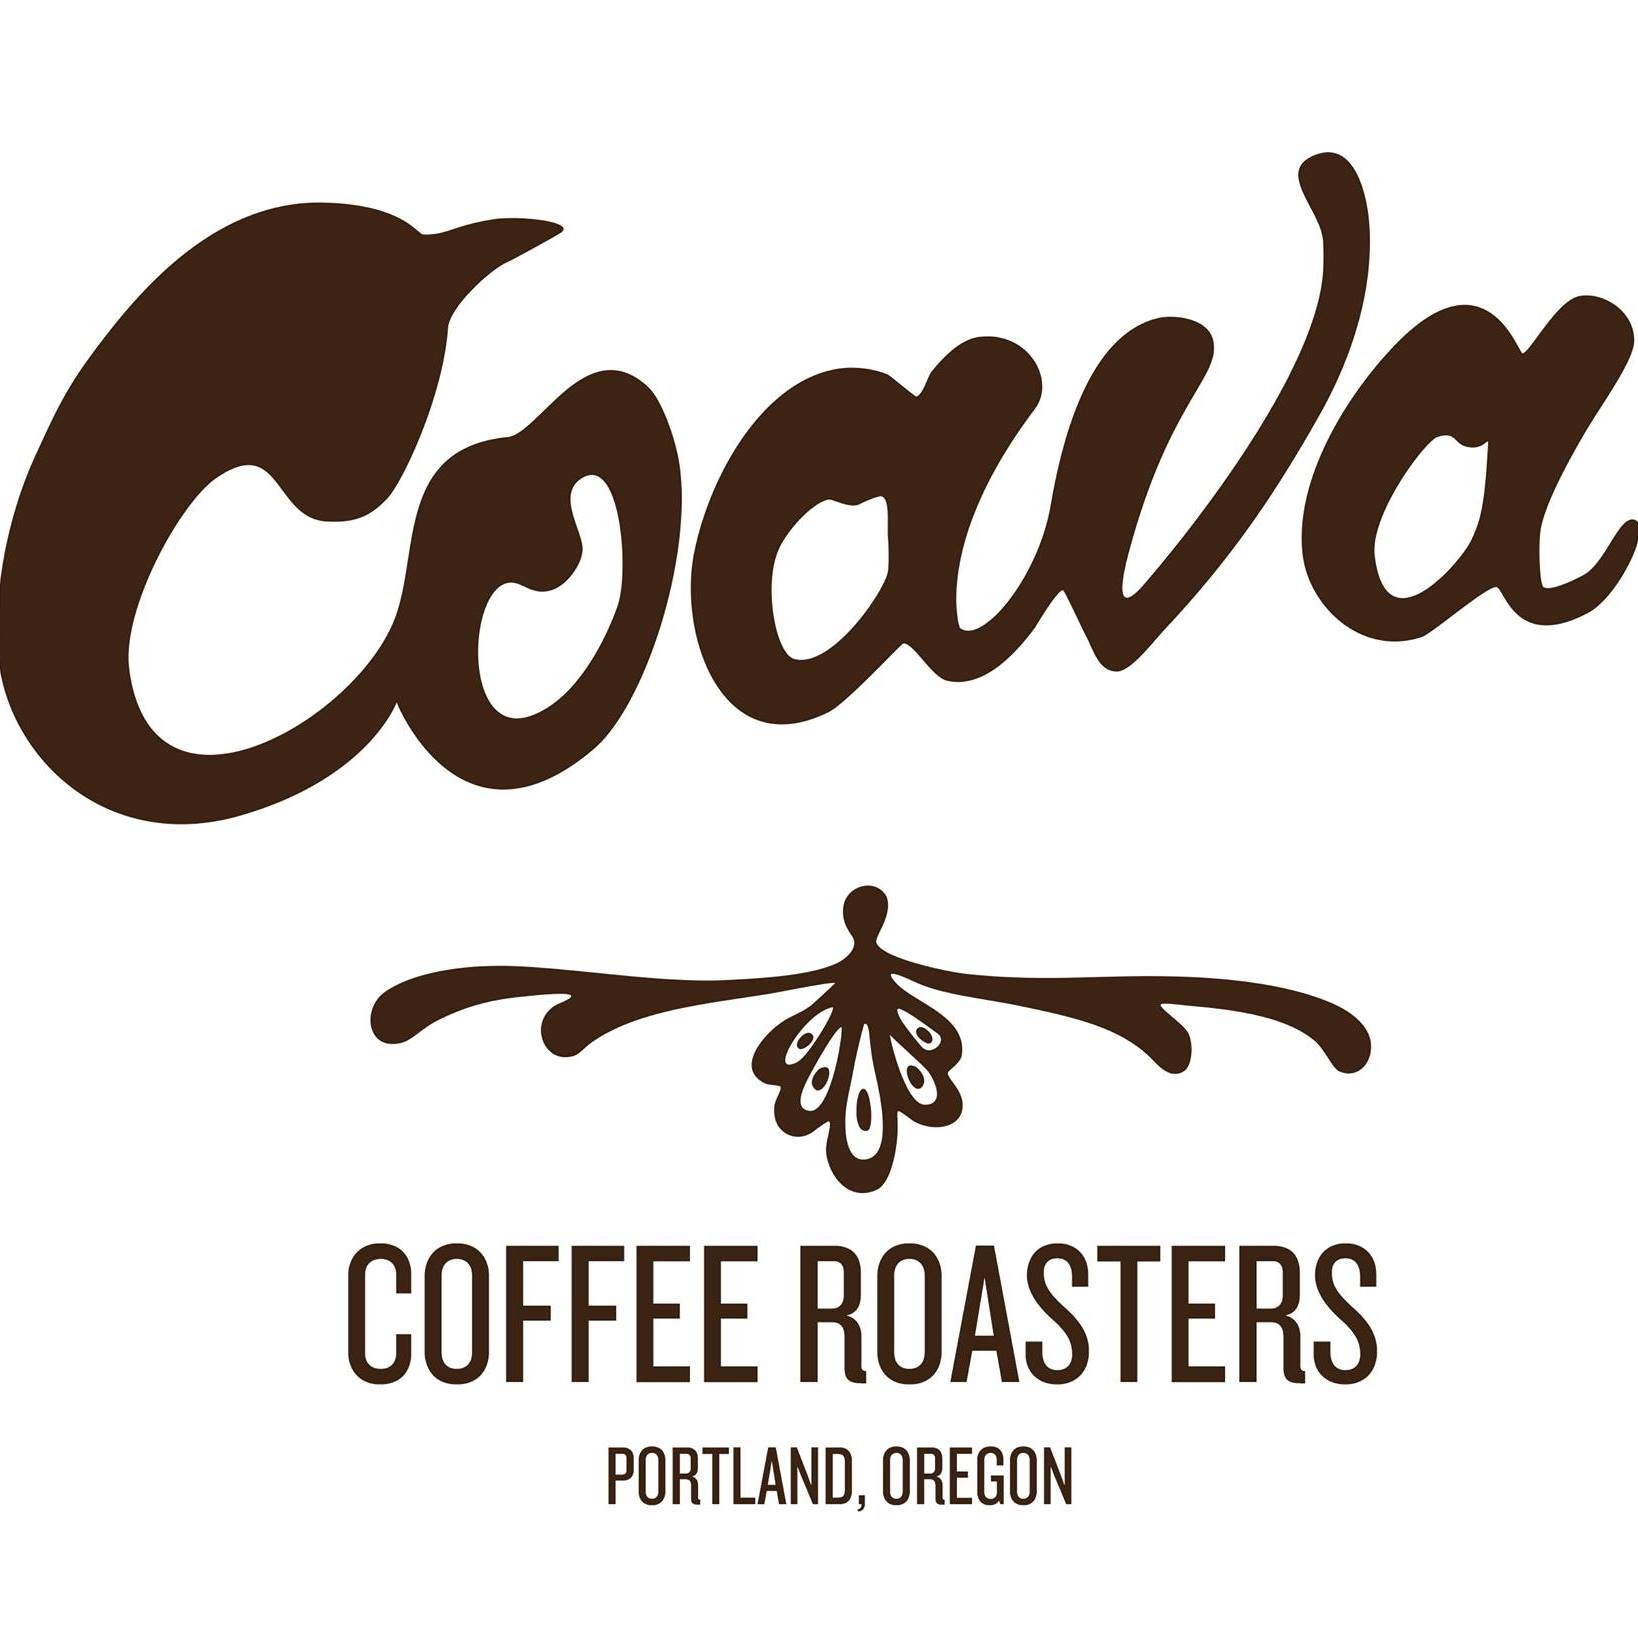 coava coffee.JPG